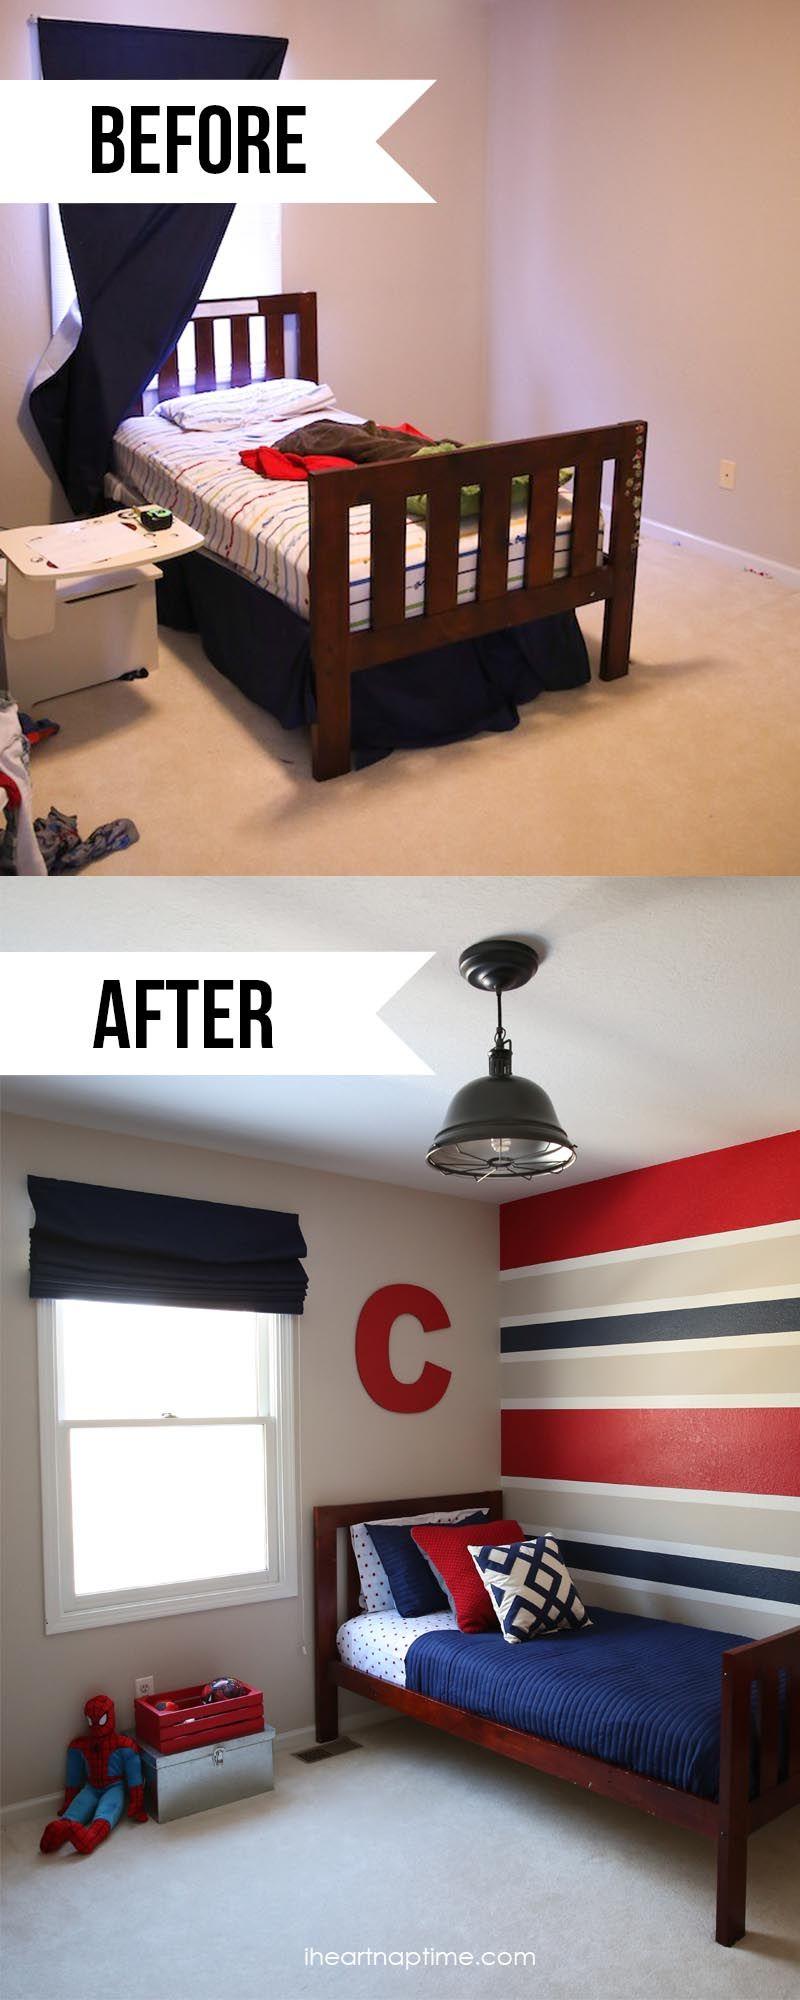 Superhero Room Design: Boys Room Decor, Superhero Room, Boy Room